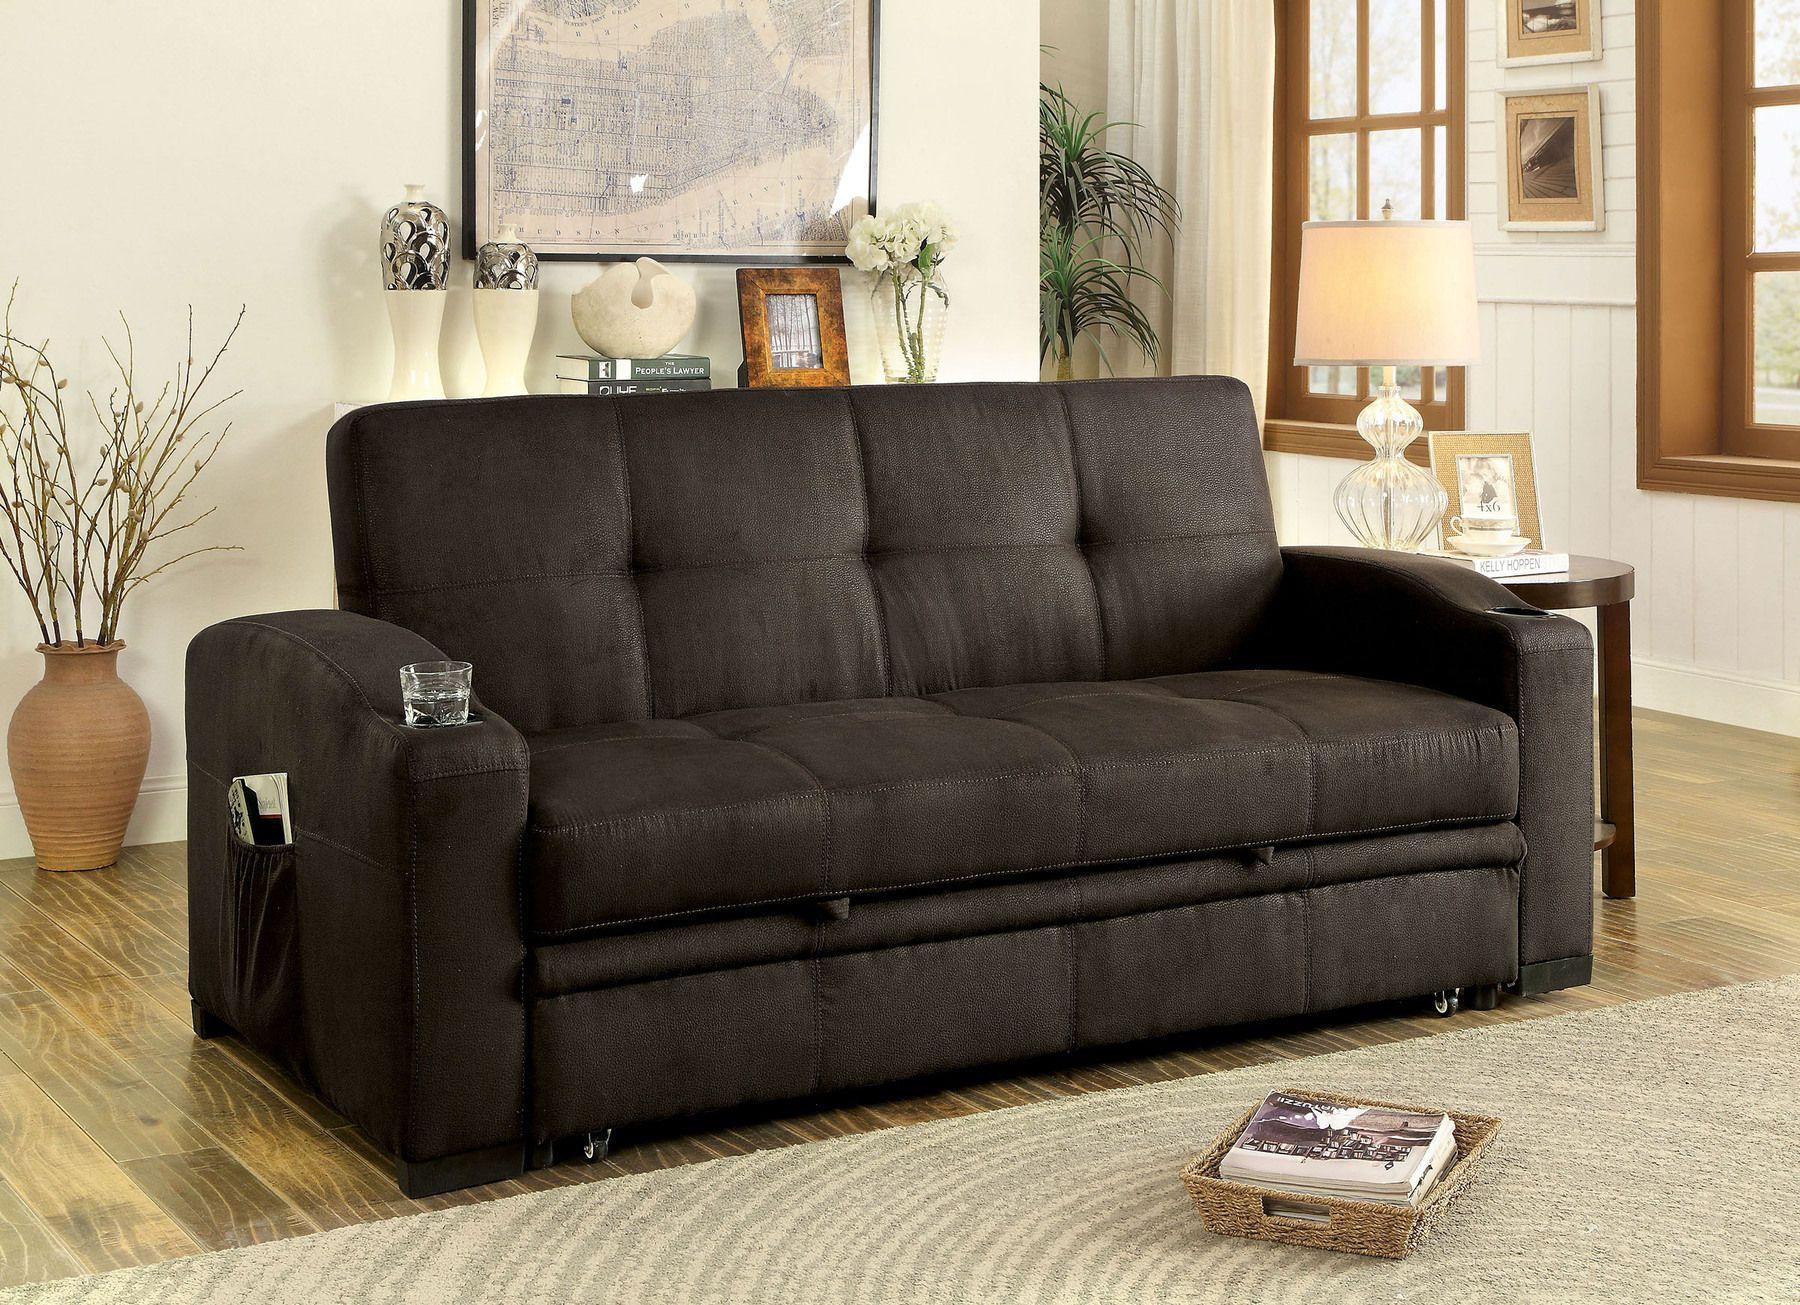 Sensational Mavis Sofa Bed In 2019 Futon Sofa Sofa Sleeper Sofa Unemploymentrelief Wooden Chair Designs For Living Room Unemploymentrelieforg